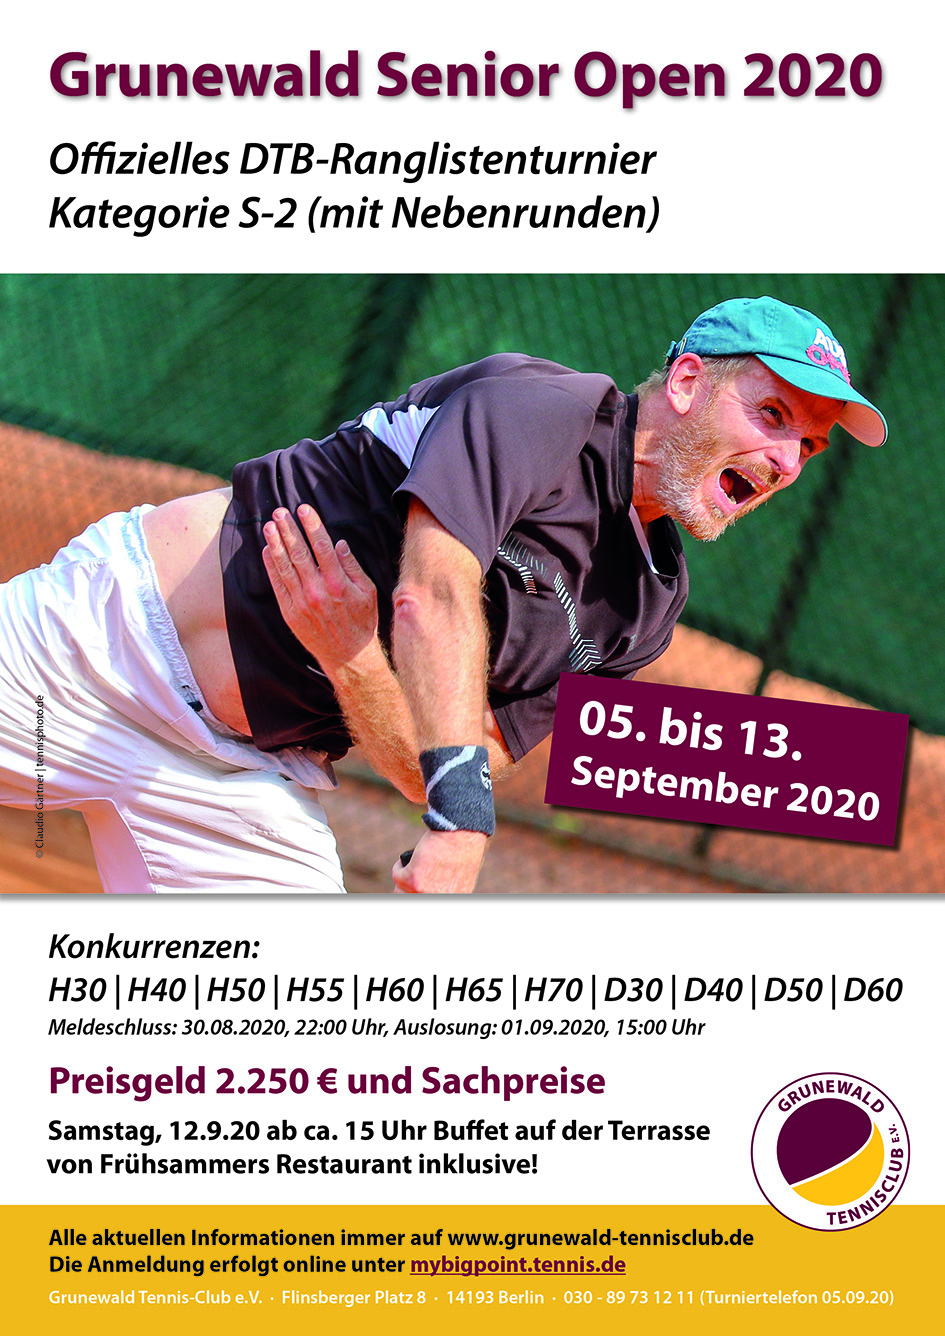 Grunewald Senior Open 2020 (S-2) - Endspiele am Sonntag ab 10:30 Uhr